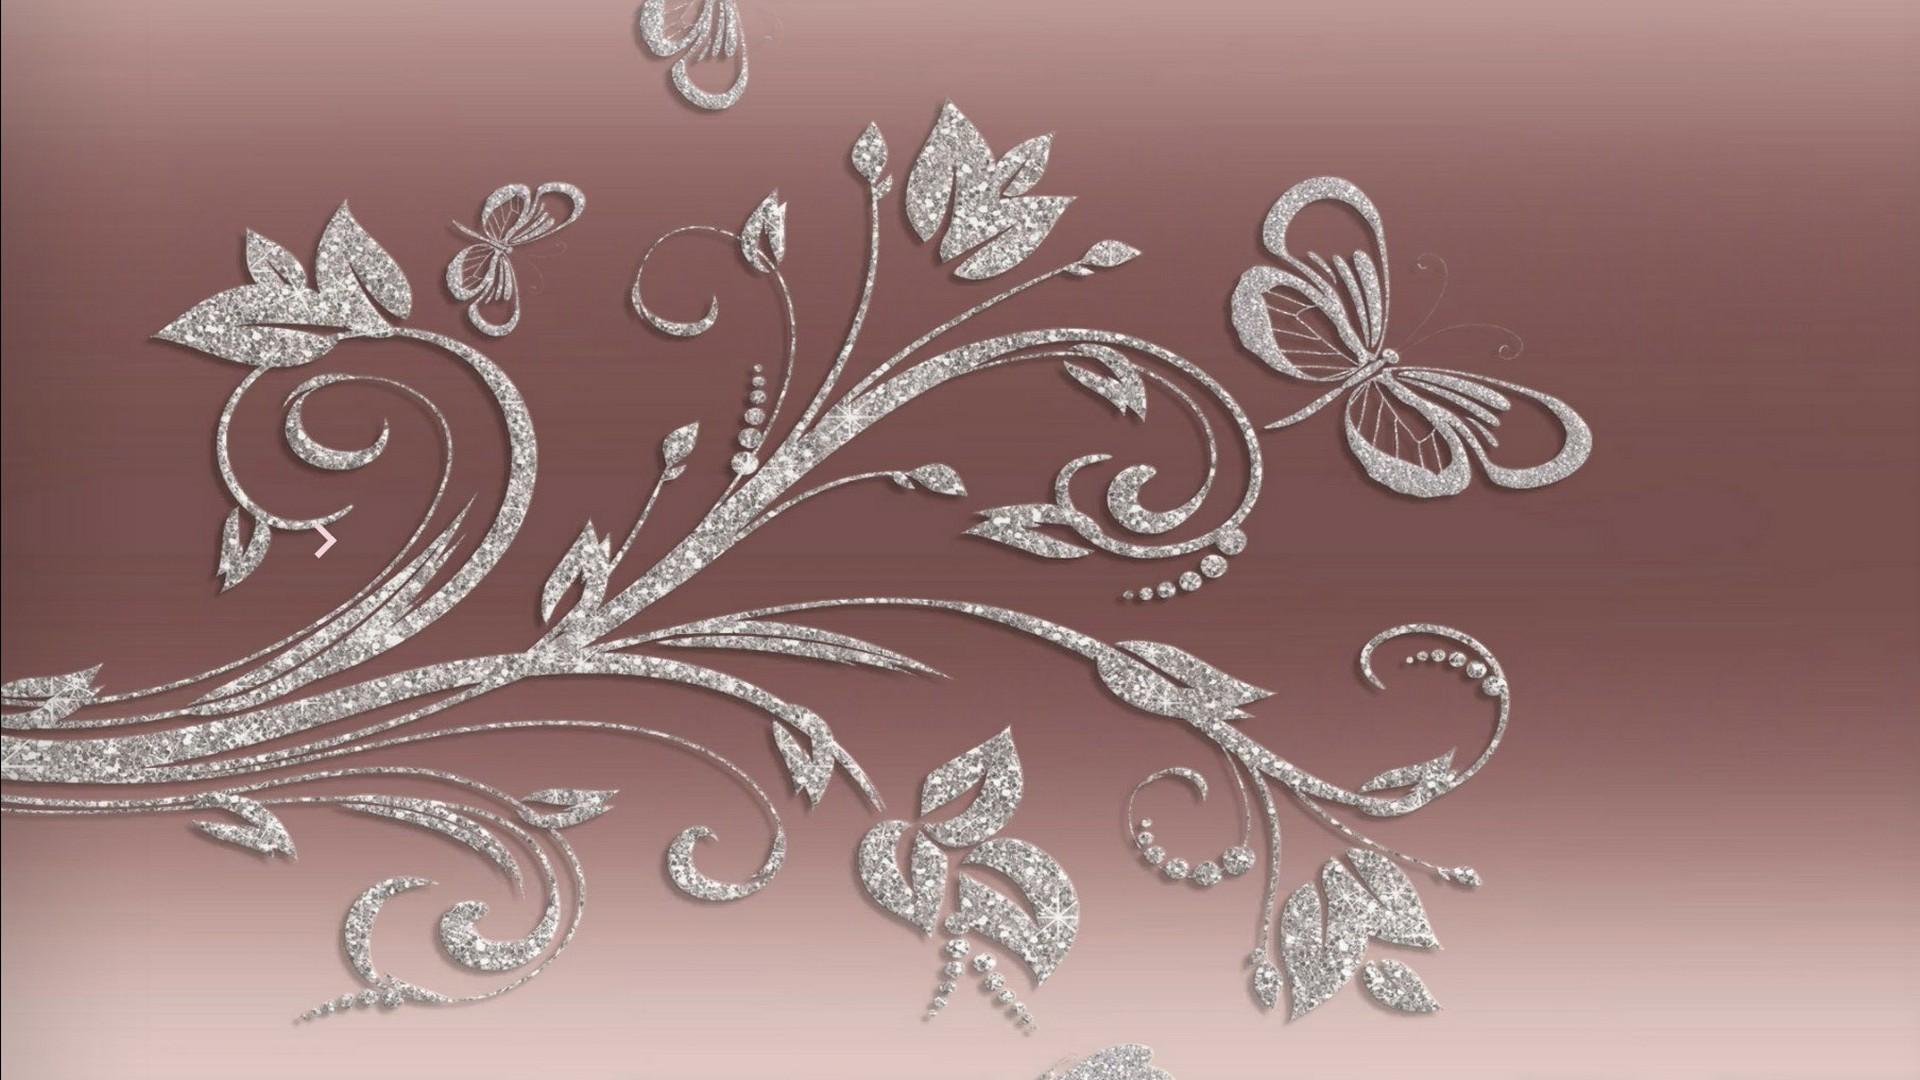 Astounding Cute Gold Rose Desktop Wallpaper 2018 Cute Screensavers Interior Design Ideas Lukepblogthenellocom